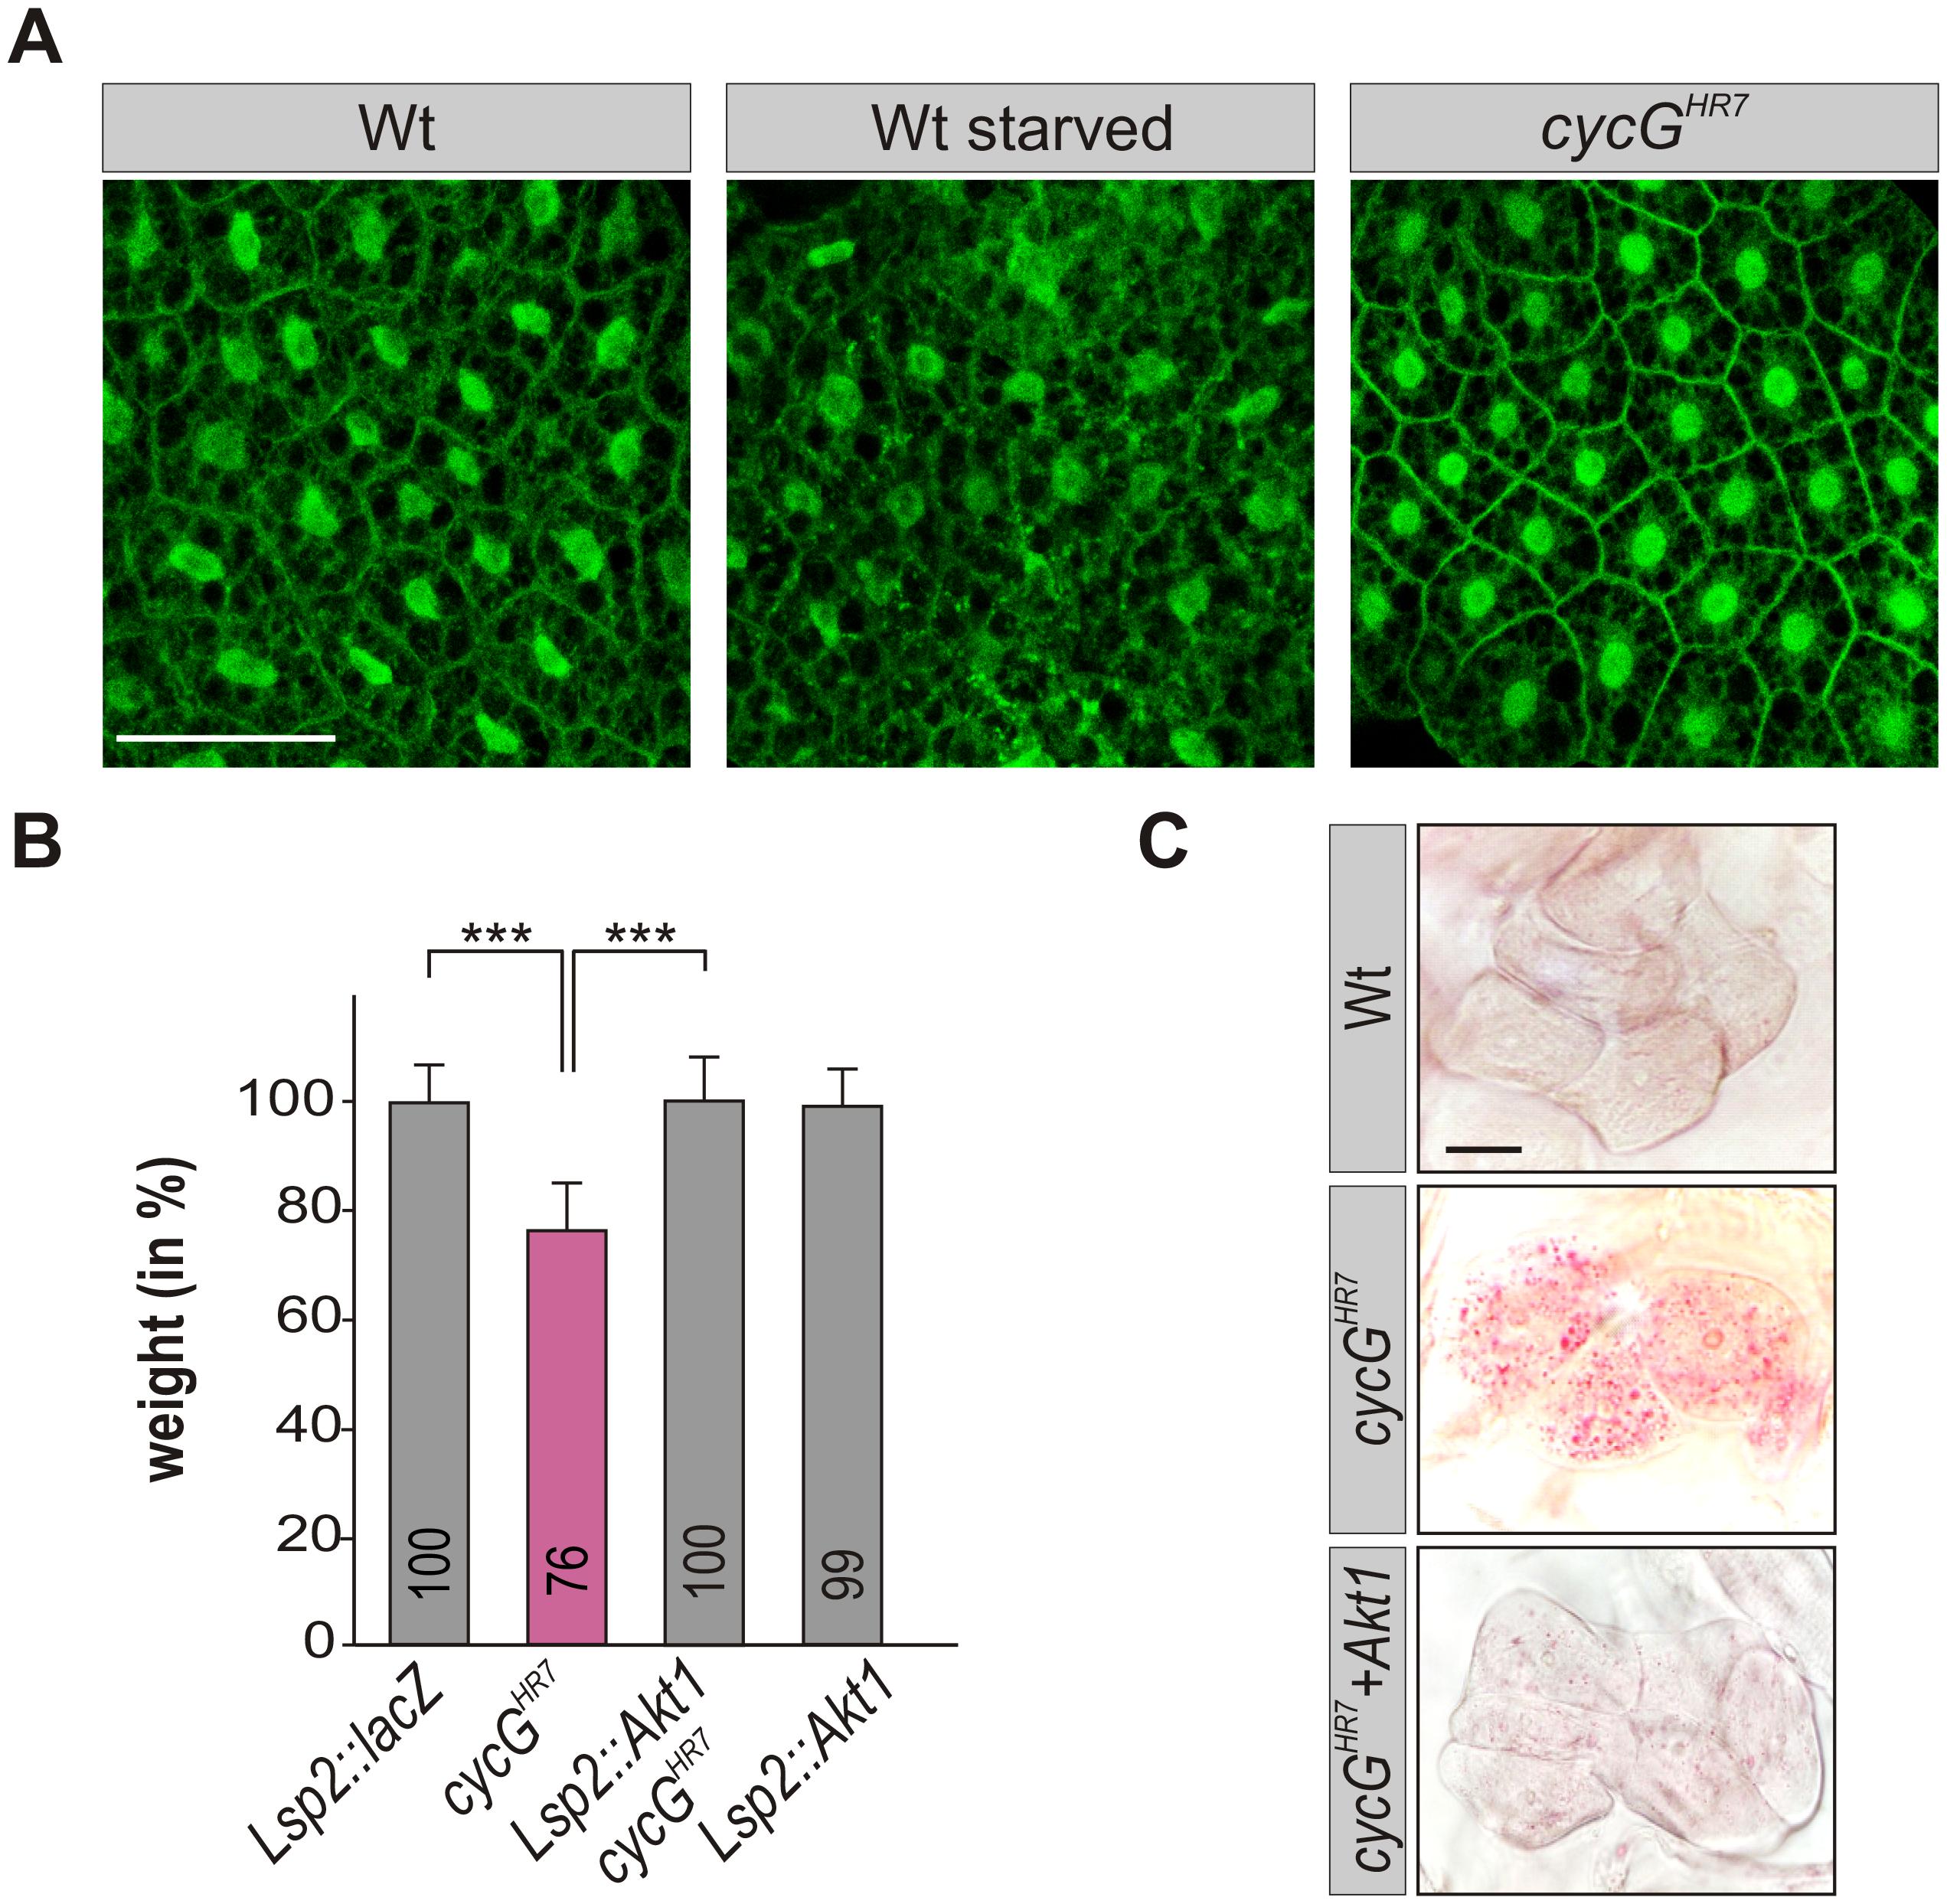 <i>CycG</i> acts genetically downstream of PI3K92E.